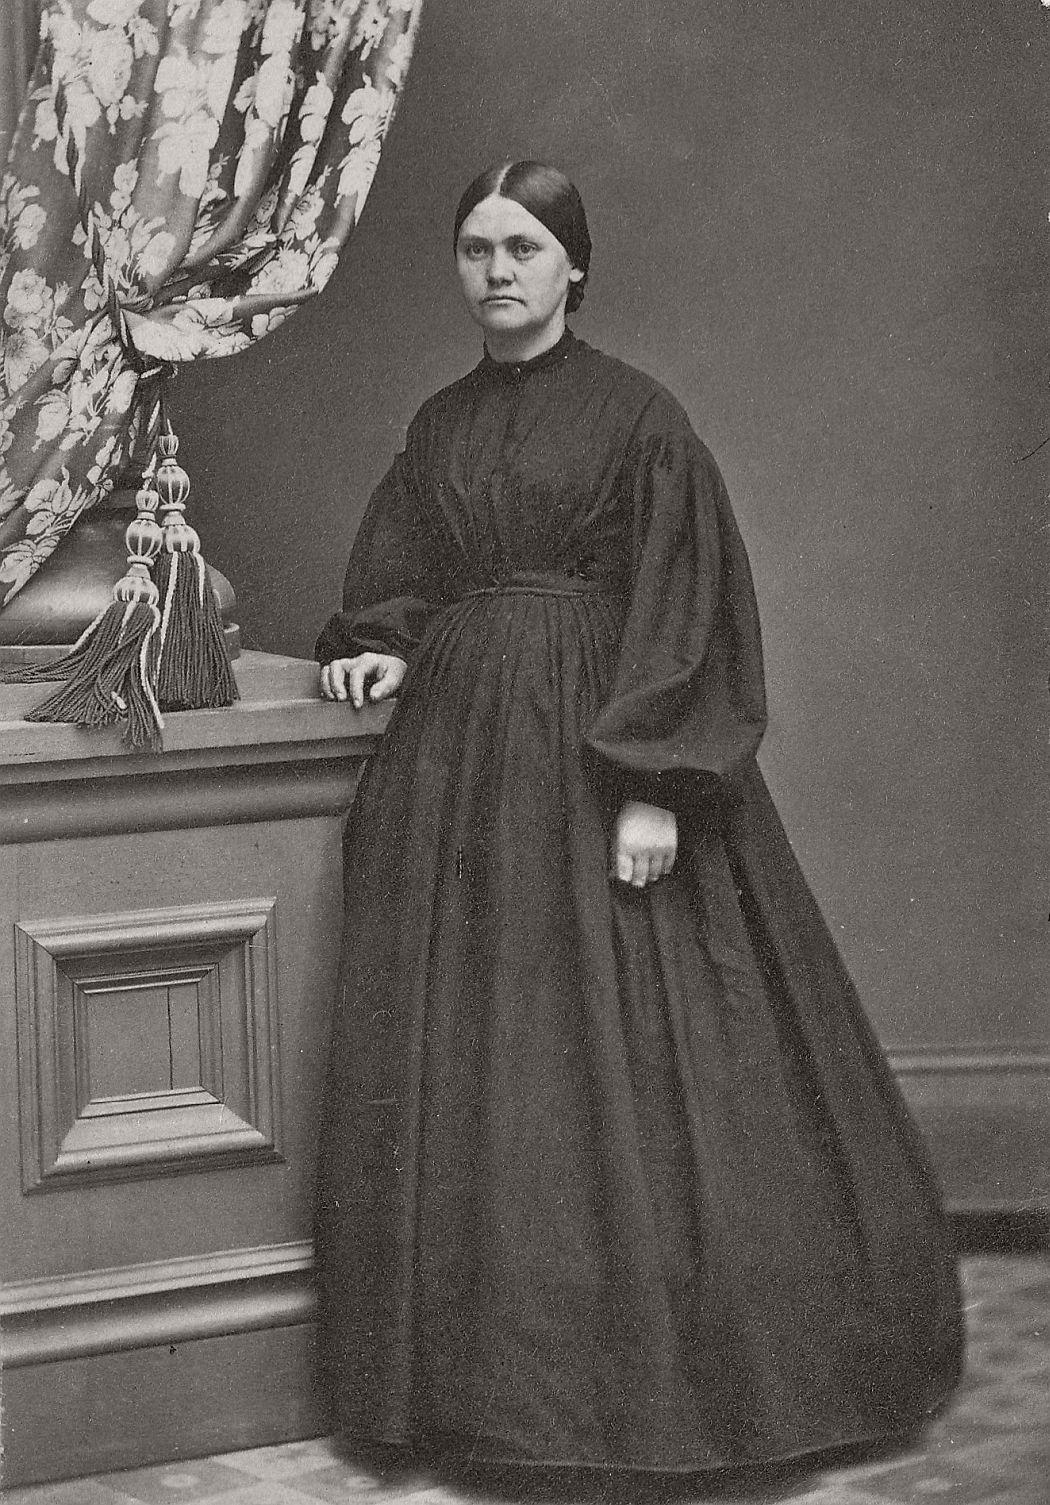 Vintage Daguerreotypes of widows in mourning (Victorian era, 1800s)